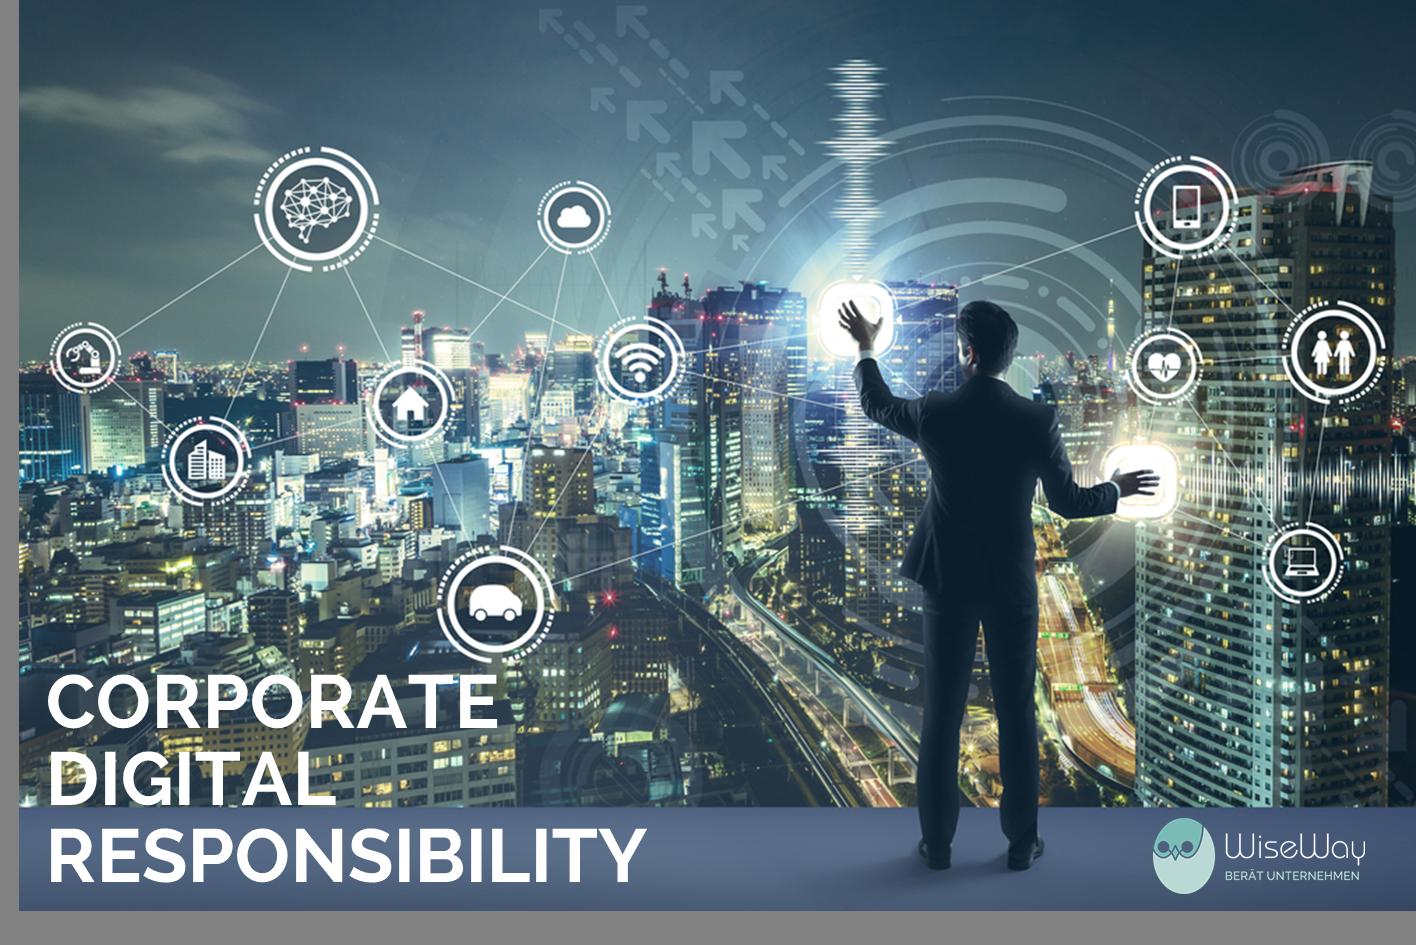 Corporate Digital Responsibility